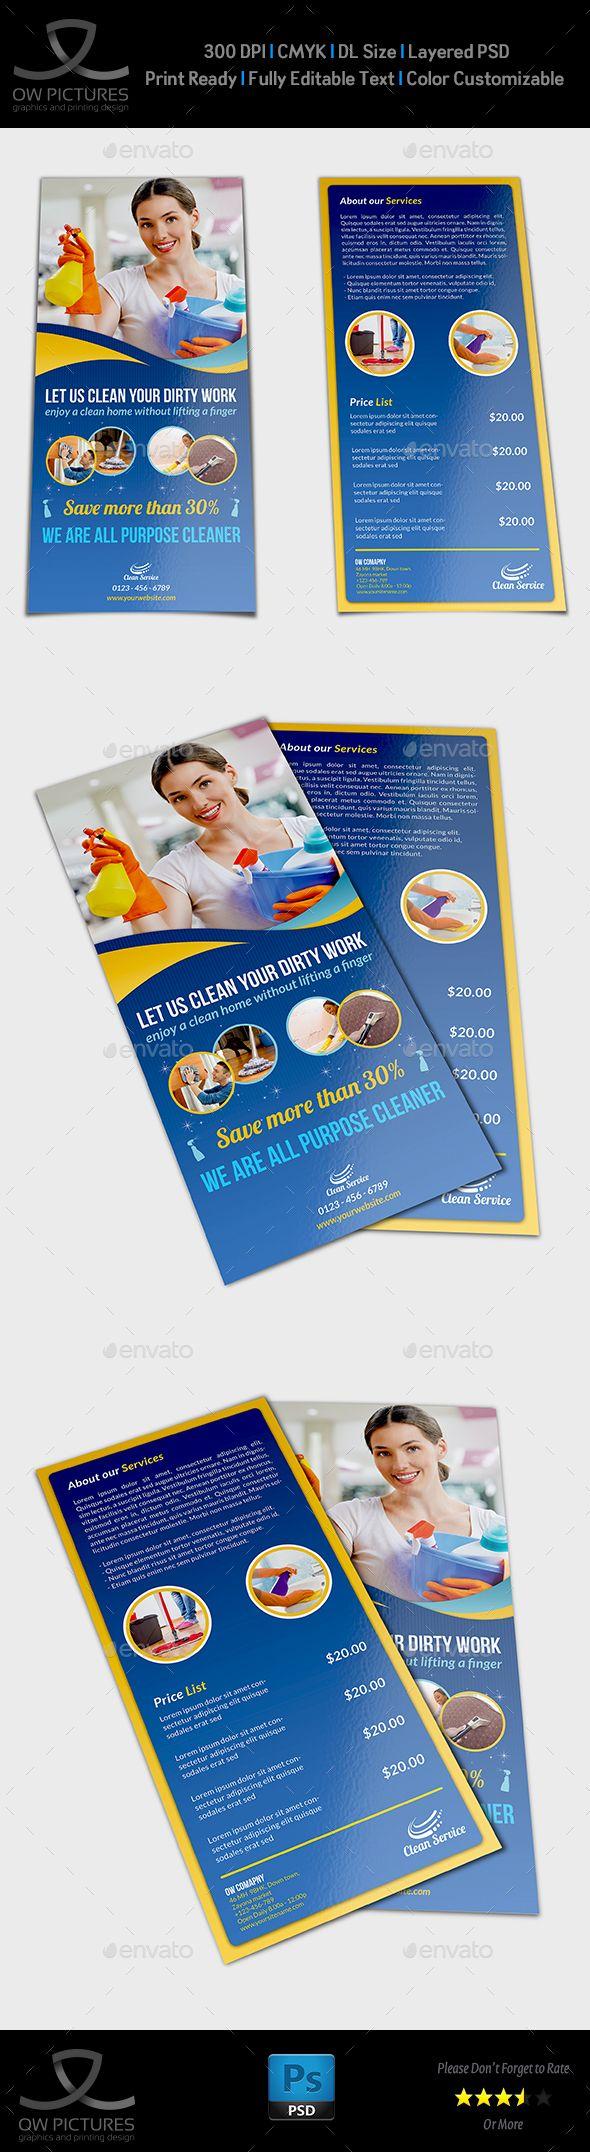 Cleaning Services Dl Flyer Template Flyer Design Pinterest